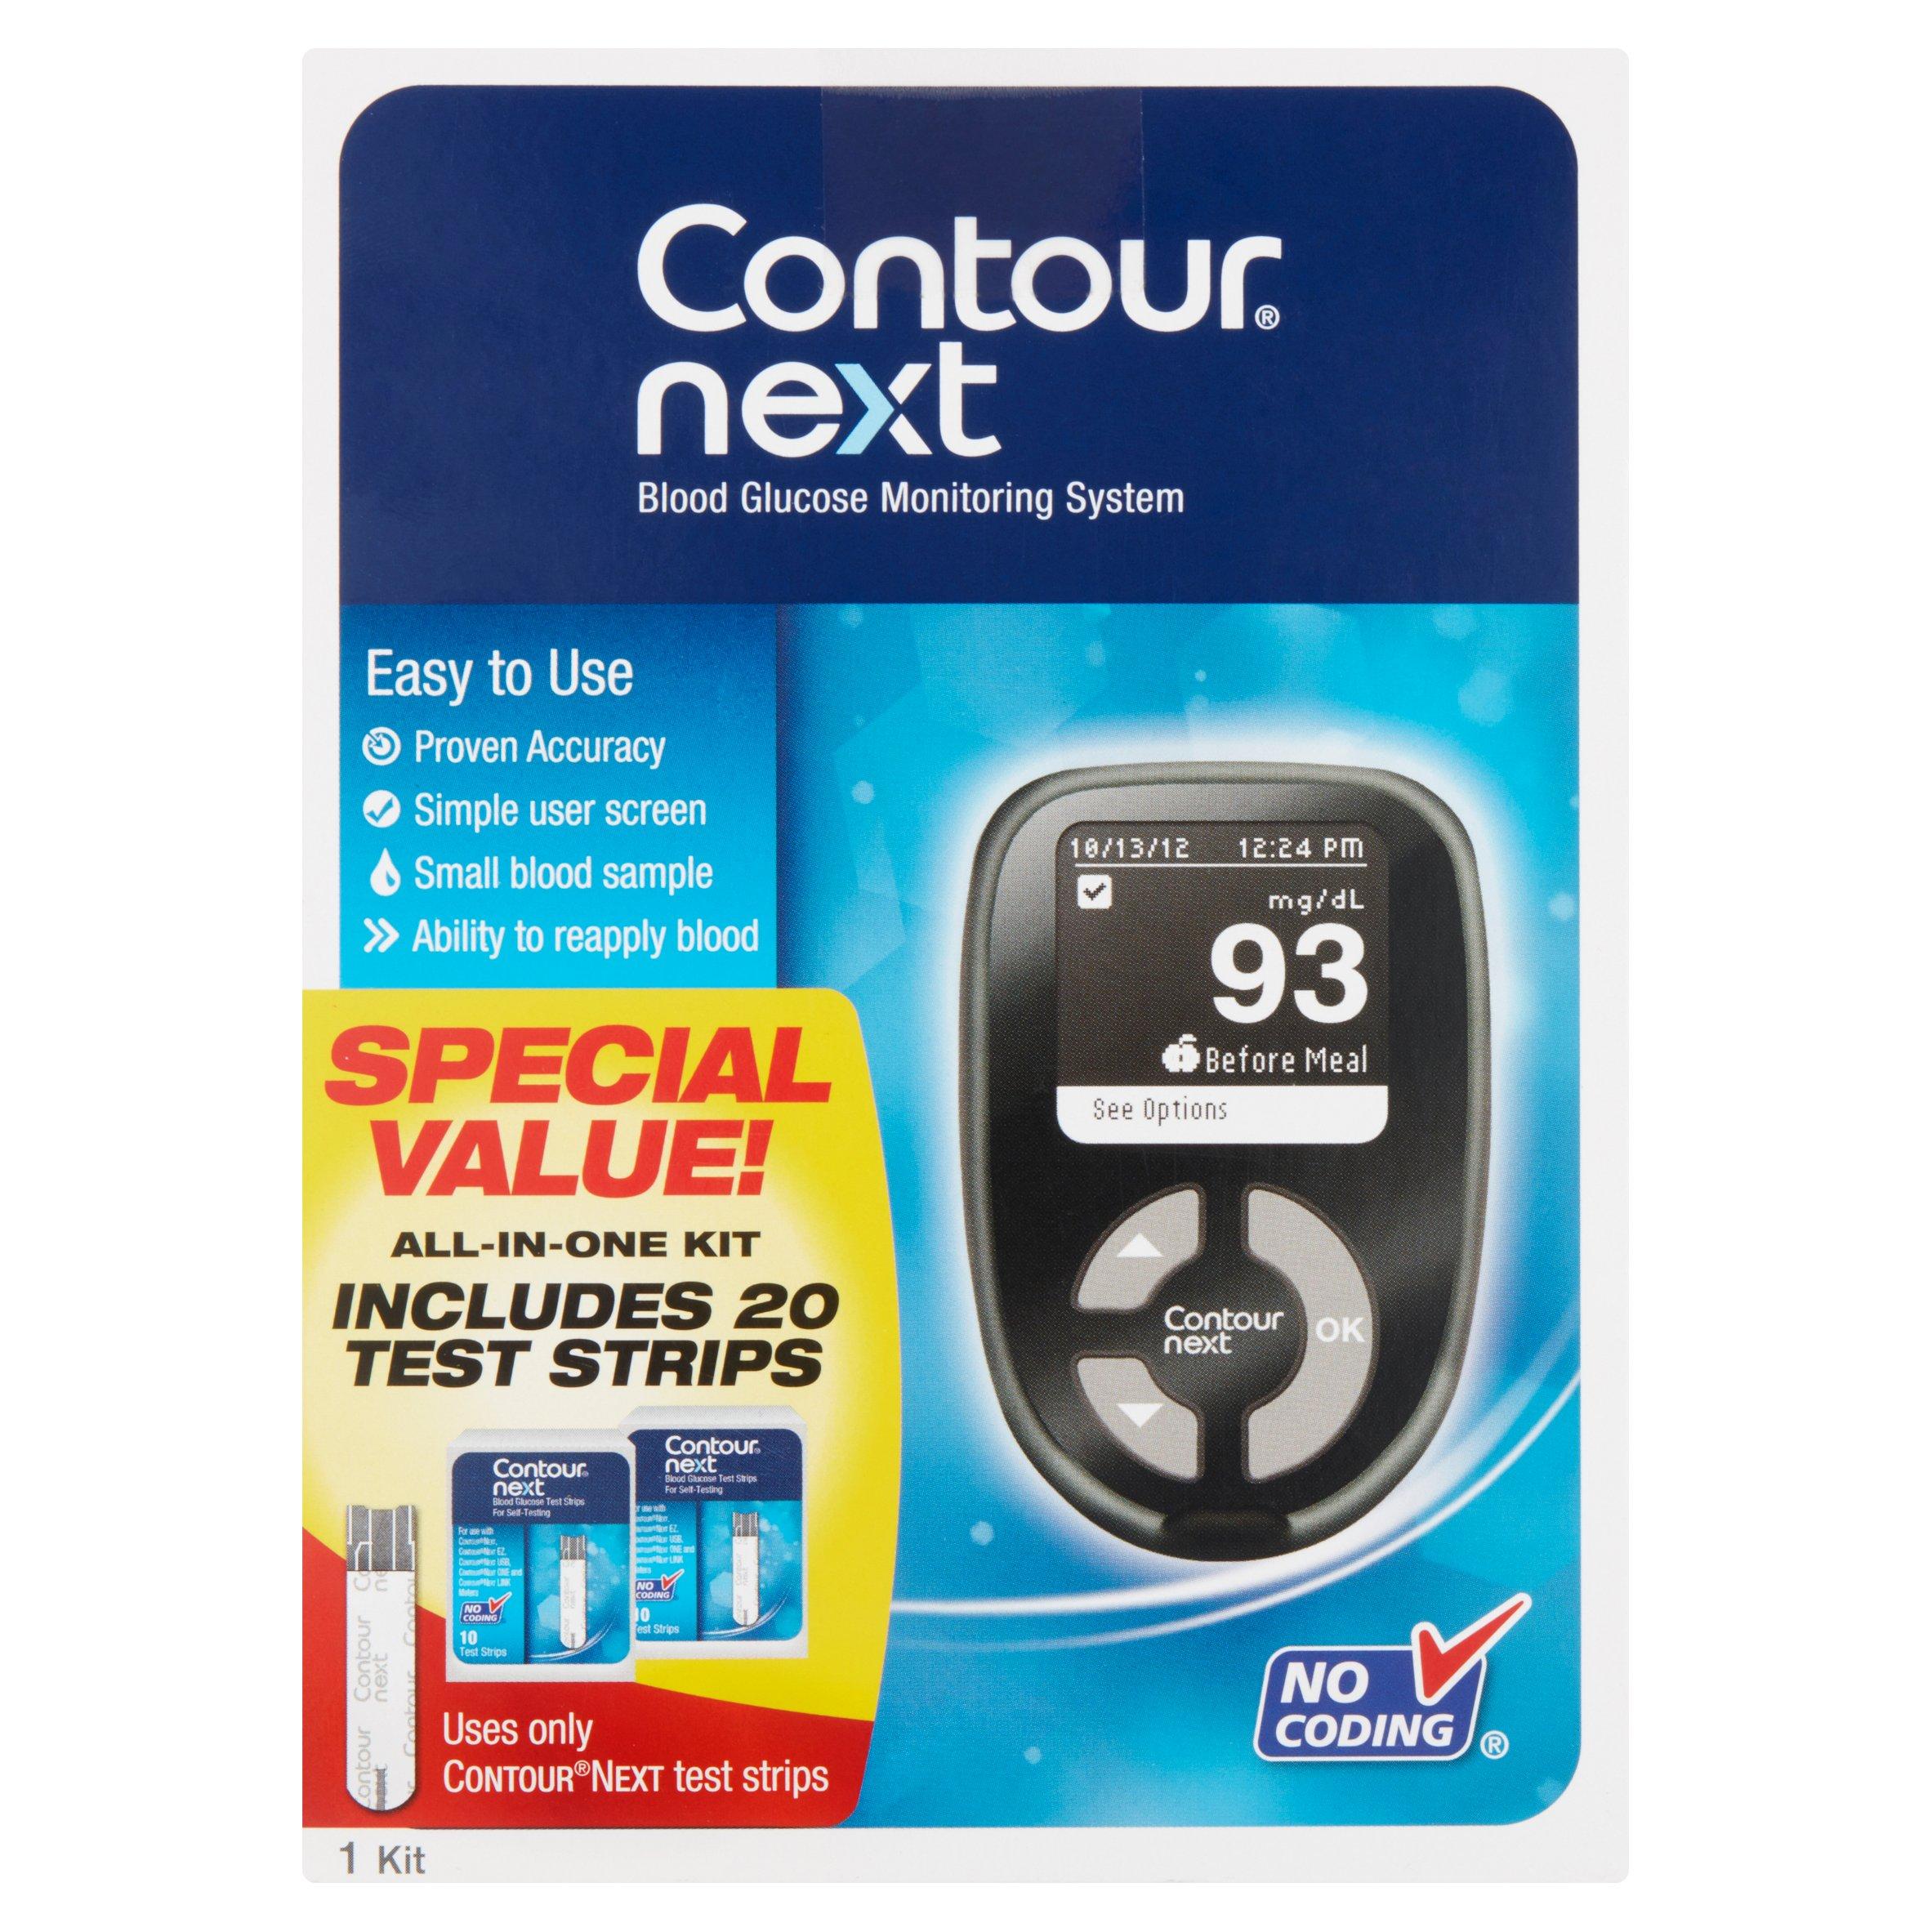 Contour Next Blood Glucose Monitoring System, 1 Kit